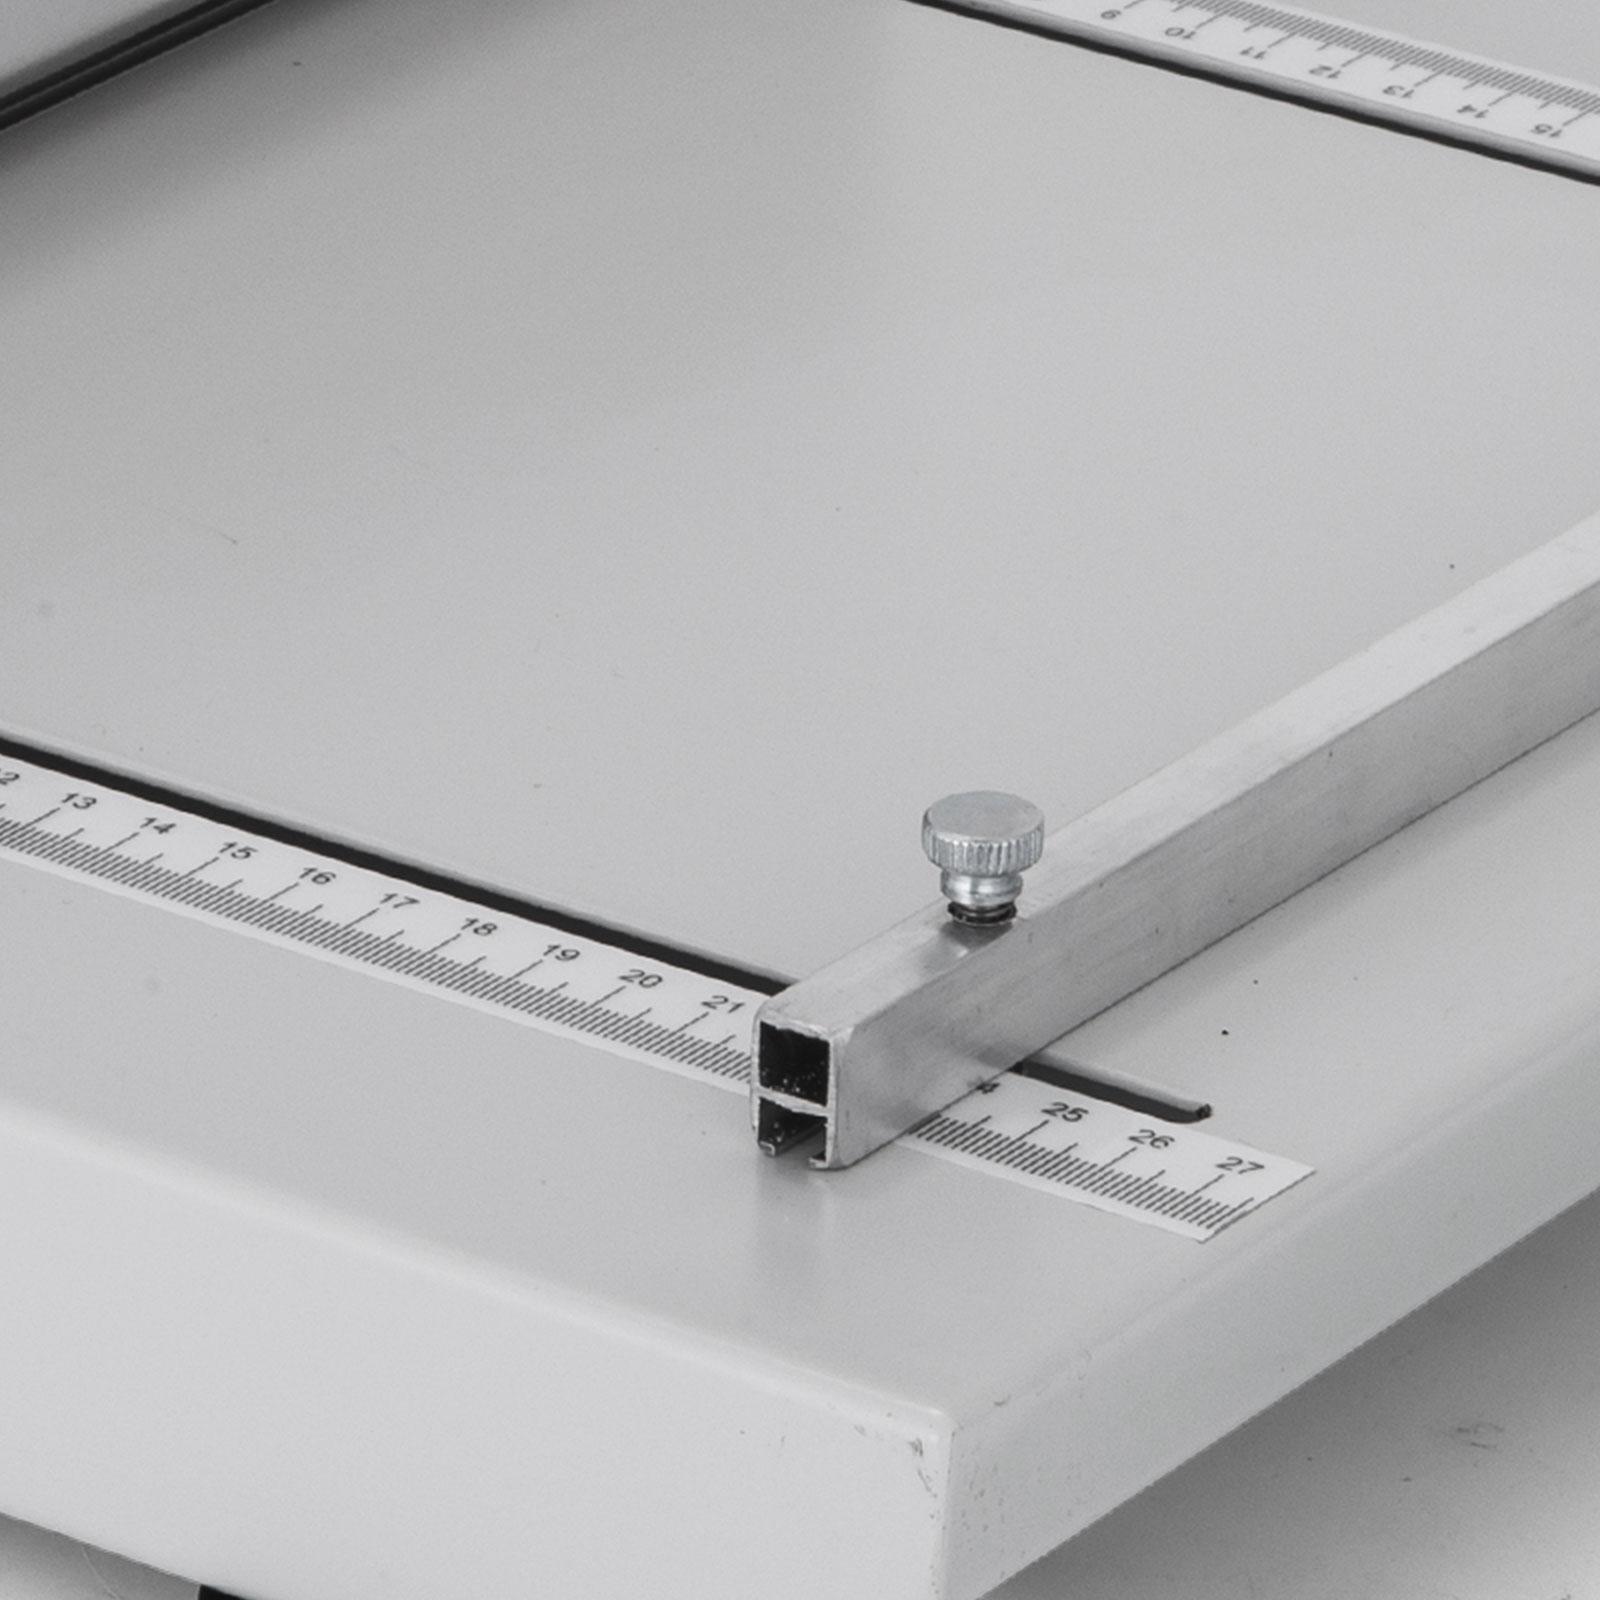 Cordonatrice-Perforatrice-Max-350-520mm-Profondita-Regolabile-Elettrica-Manuale miniatura 68